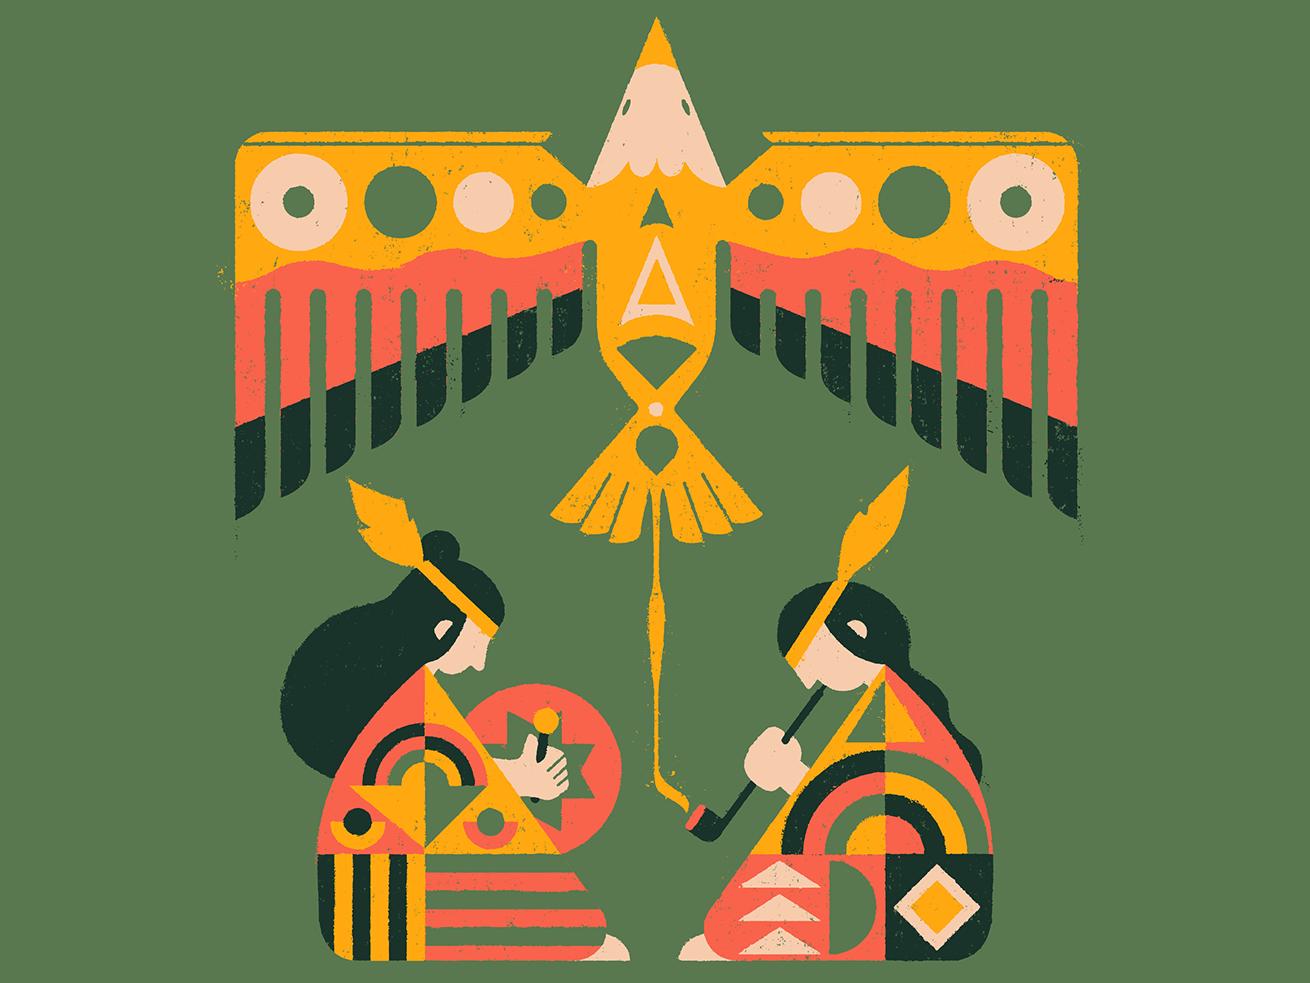 Wakan Tanka sacred geometry ceremony drum pipe tobacco eagle native american lakota texture distressed illustration mexico guadalajara